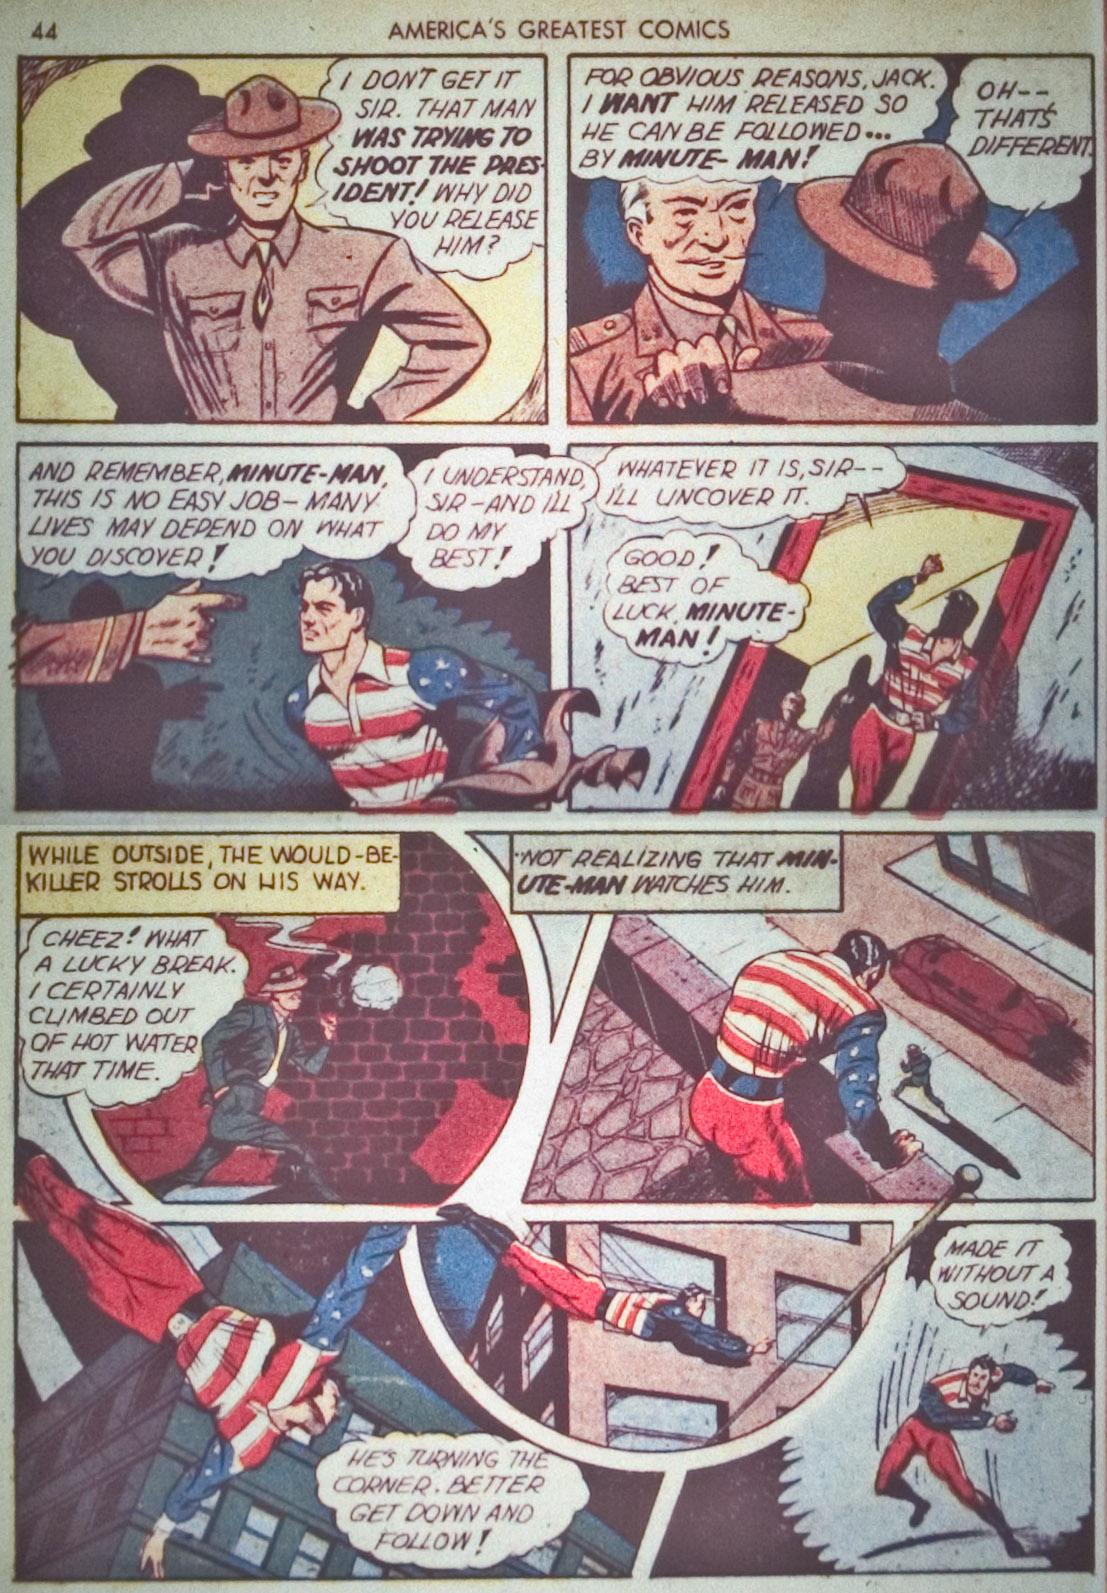 Read online America's Greatest Comics comic -  Issue #1 - 47